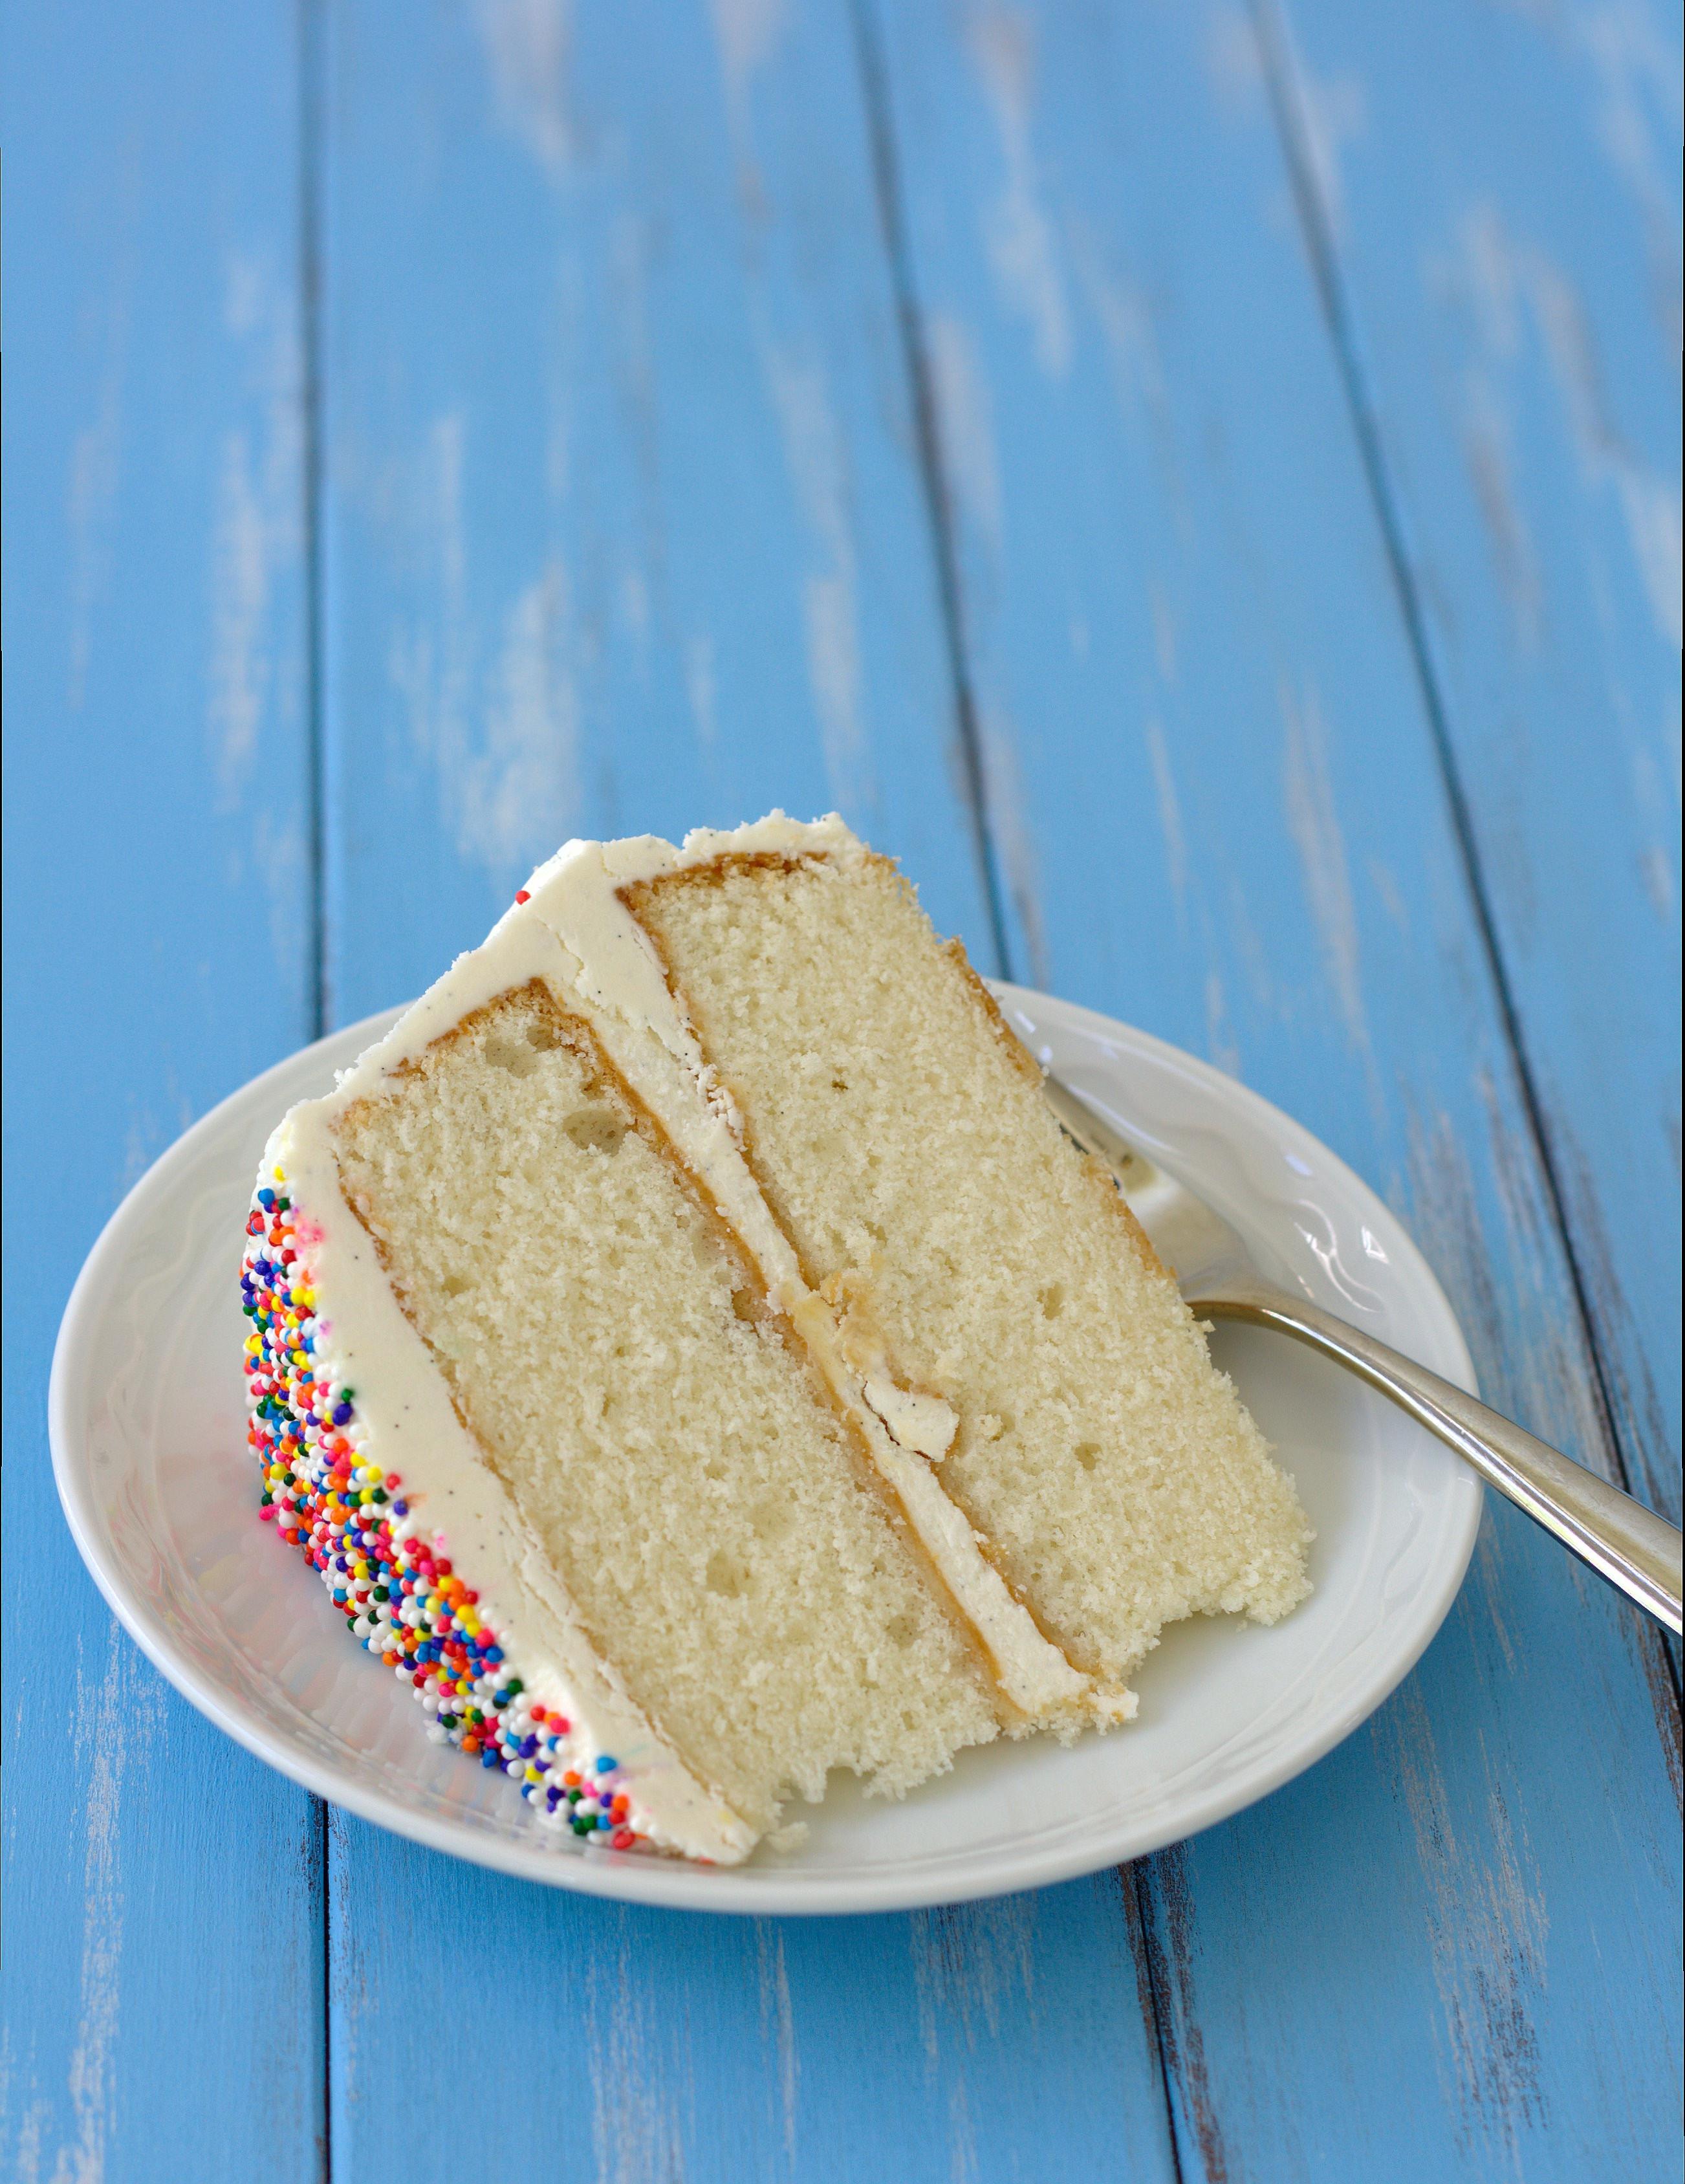 Fluffy Vanilla Cake Recipe  Fluffy Vanilla Cake with Whipped Vanilla Bean Frosting